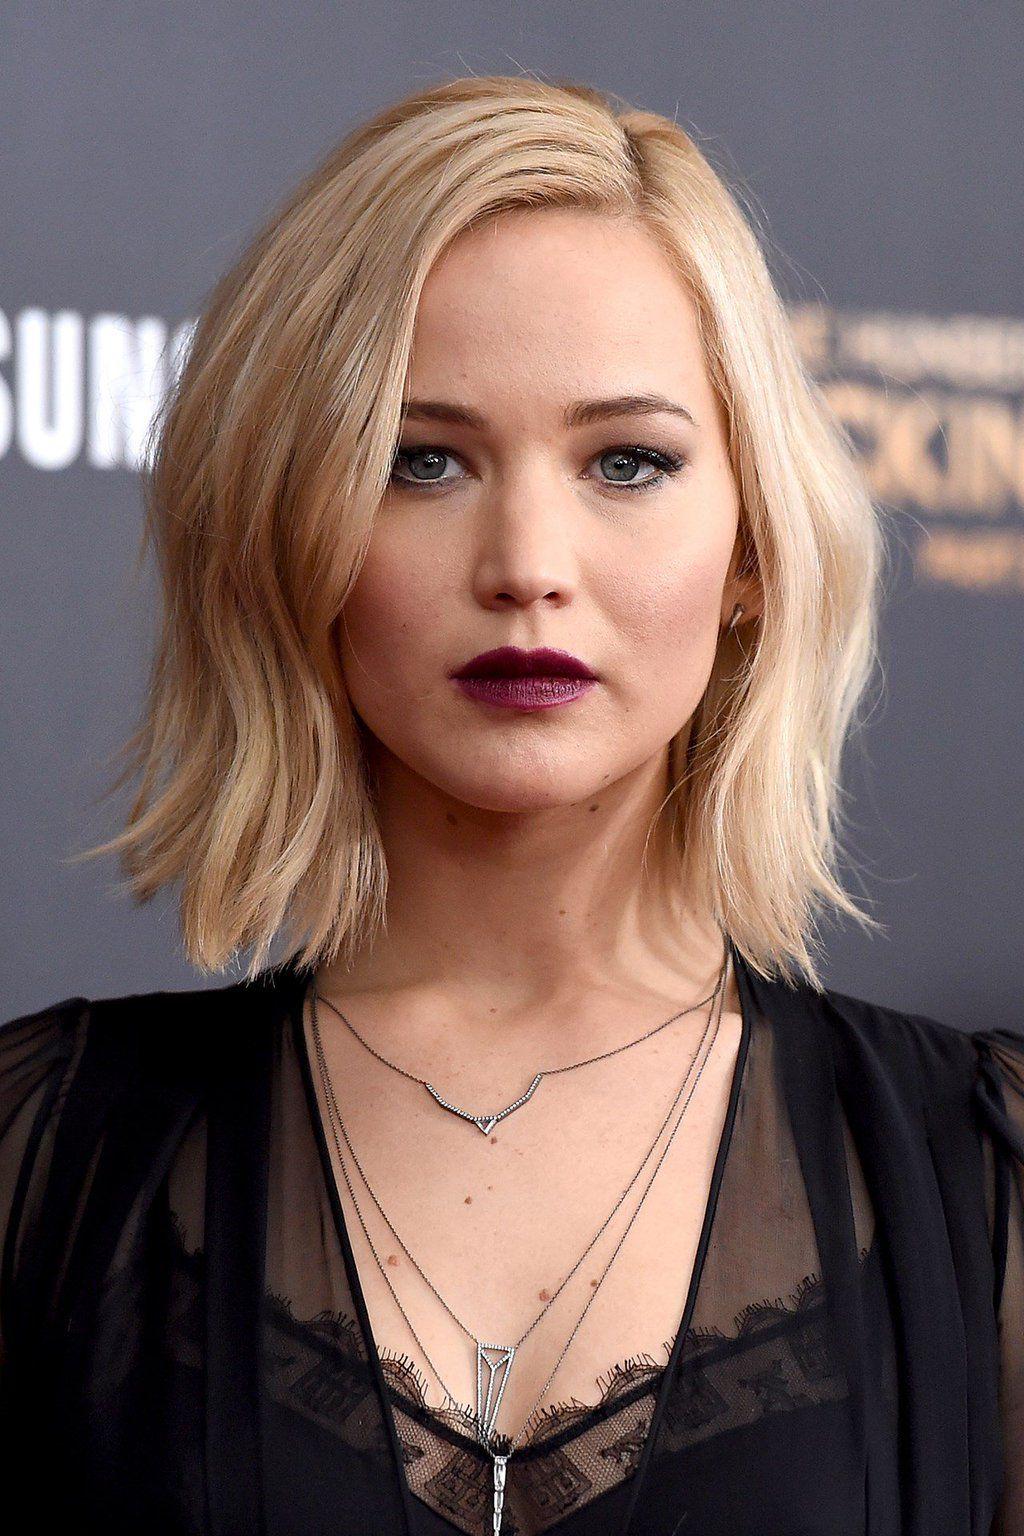 Bob-Frisur leicht wellig Jennifer Lawrence